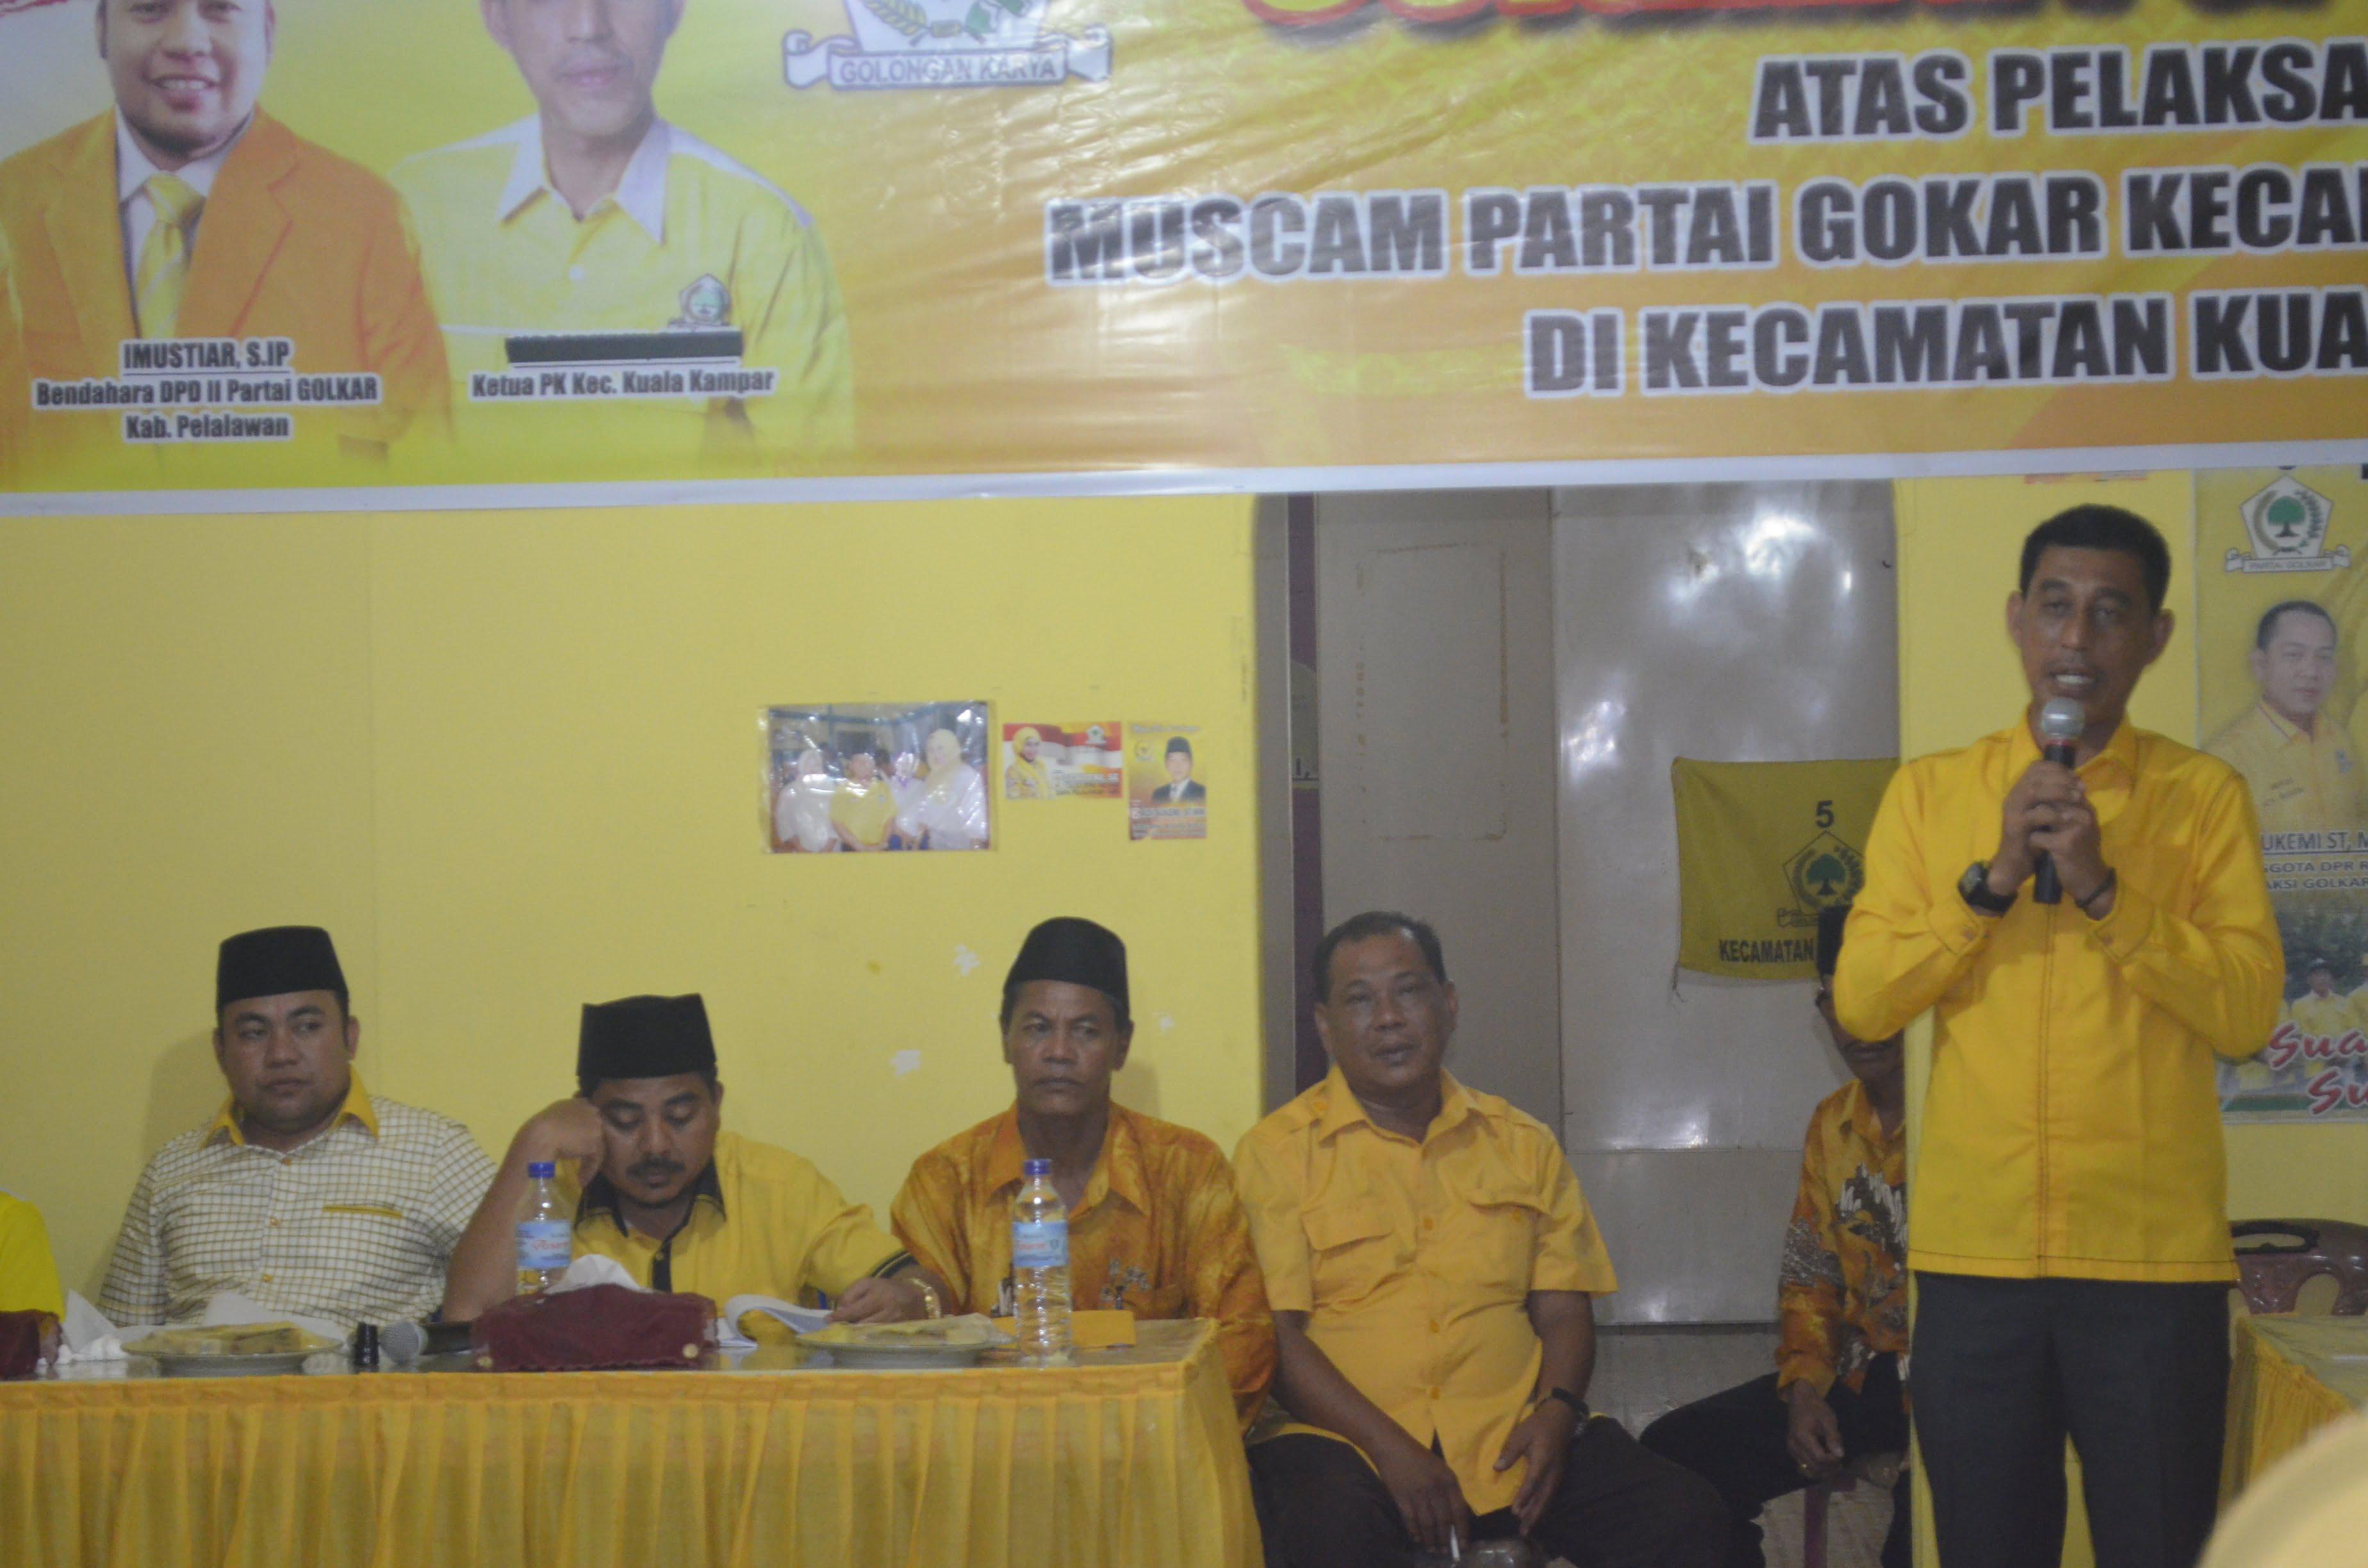 Said Mashudi saat pidato politiknya stelah terpilih kembali menjadi Ketua PK GOLKAR Kecamatan Kuala Kampar